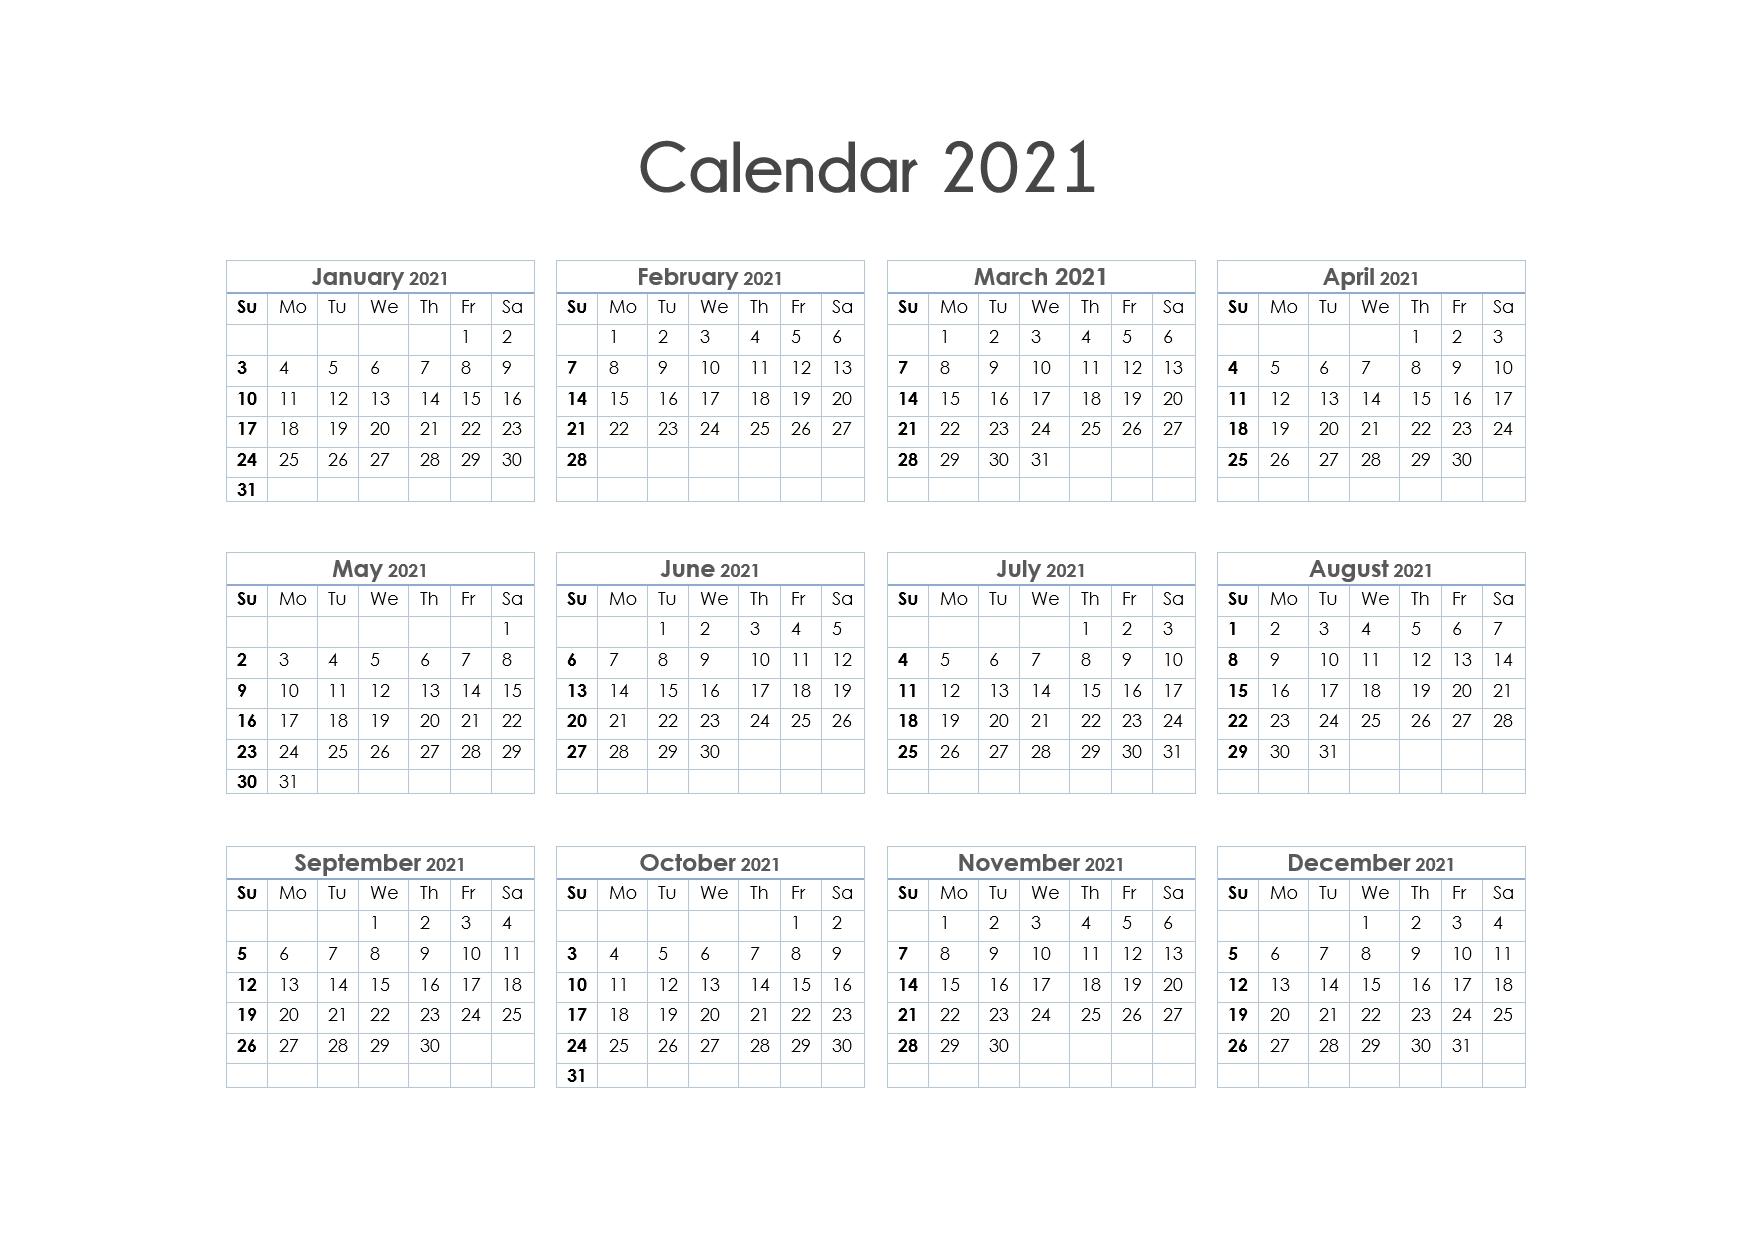 Printable Calendar 2021 One Page, Yearly Calendar, Blank  12 Month Calendar 2021 Printable